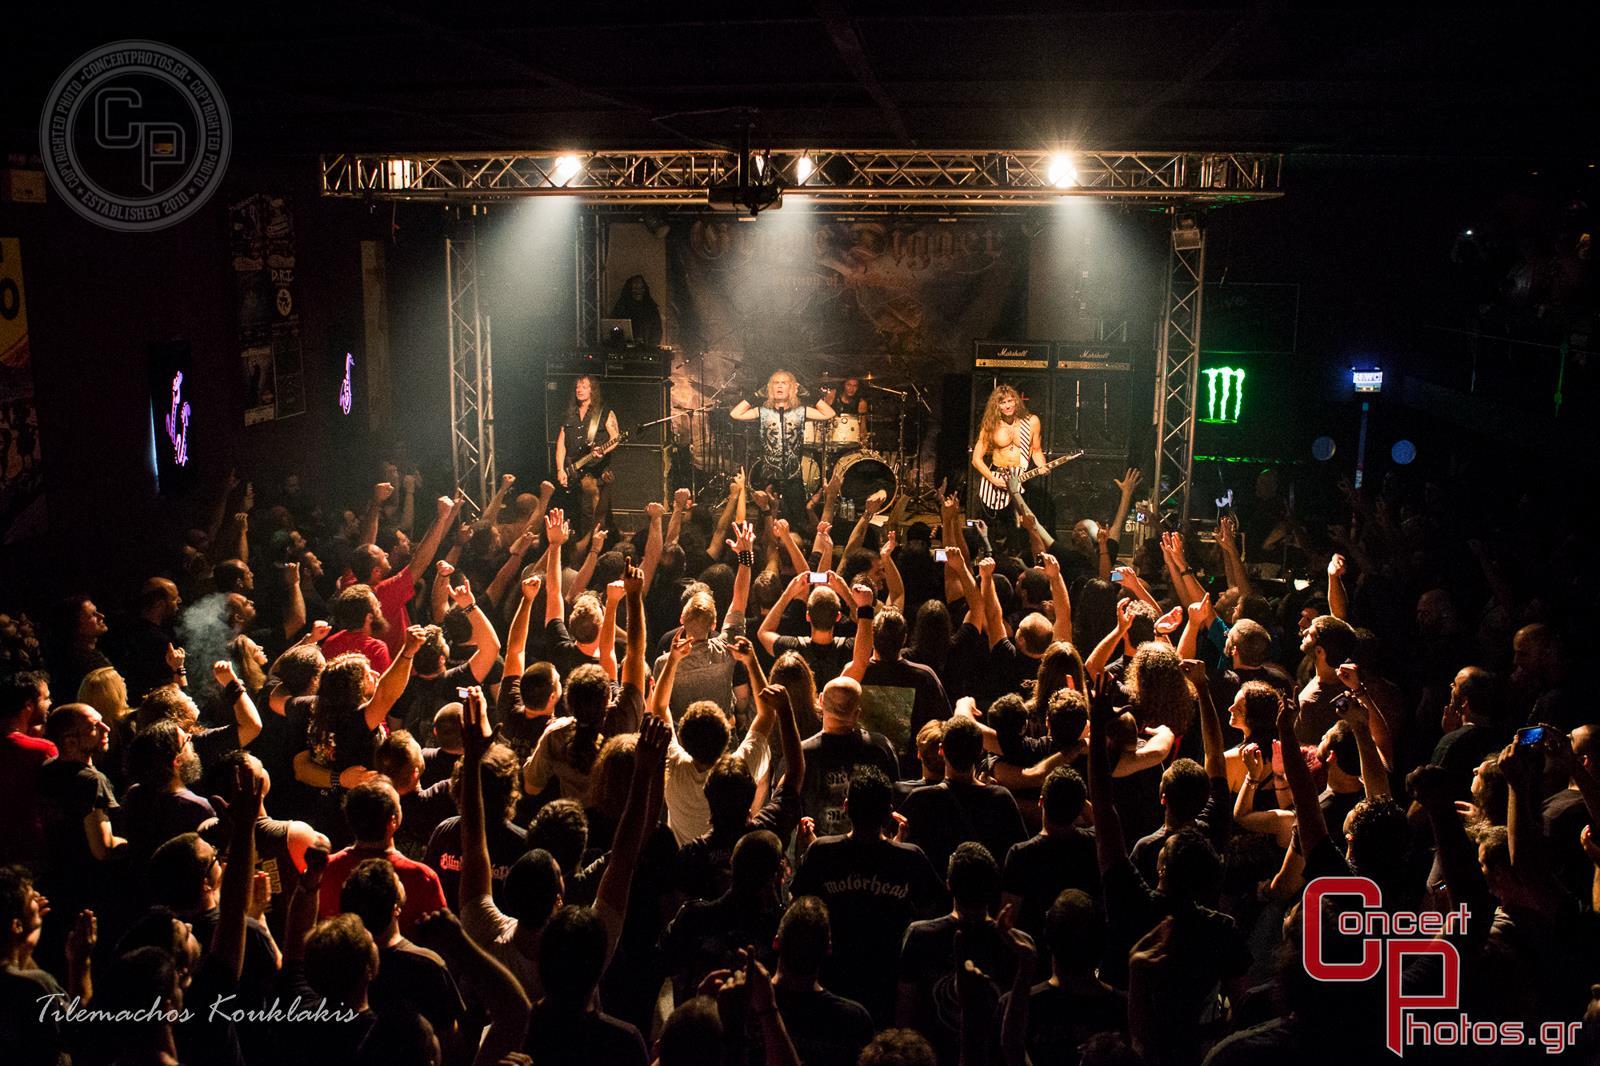 Grave Digger & Silent Rage -Grave Digger Silent Rage Kyttaro photographer:  - ConcertPhotos - 20140919_2326_28